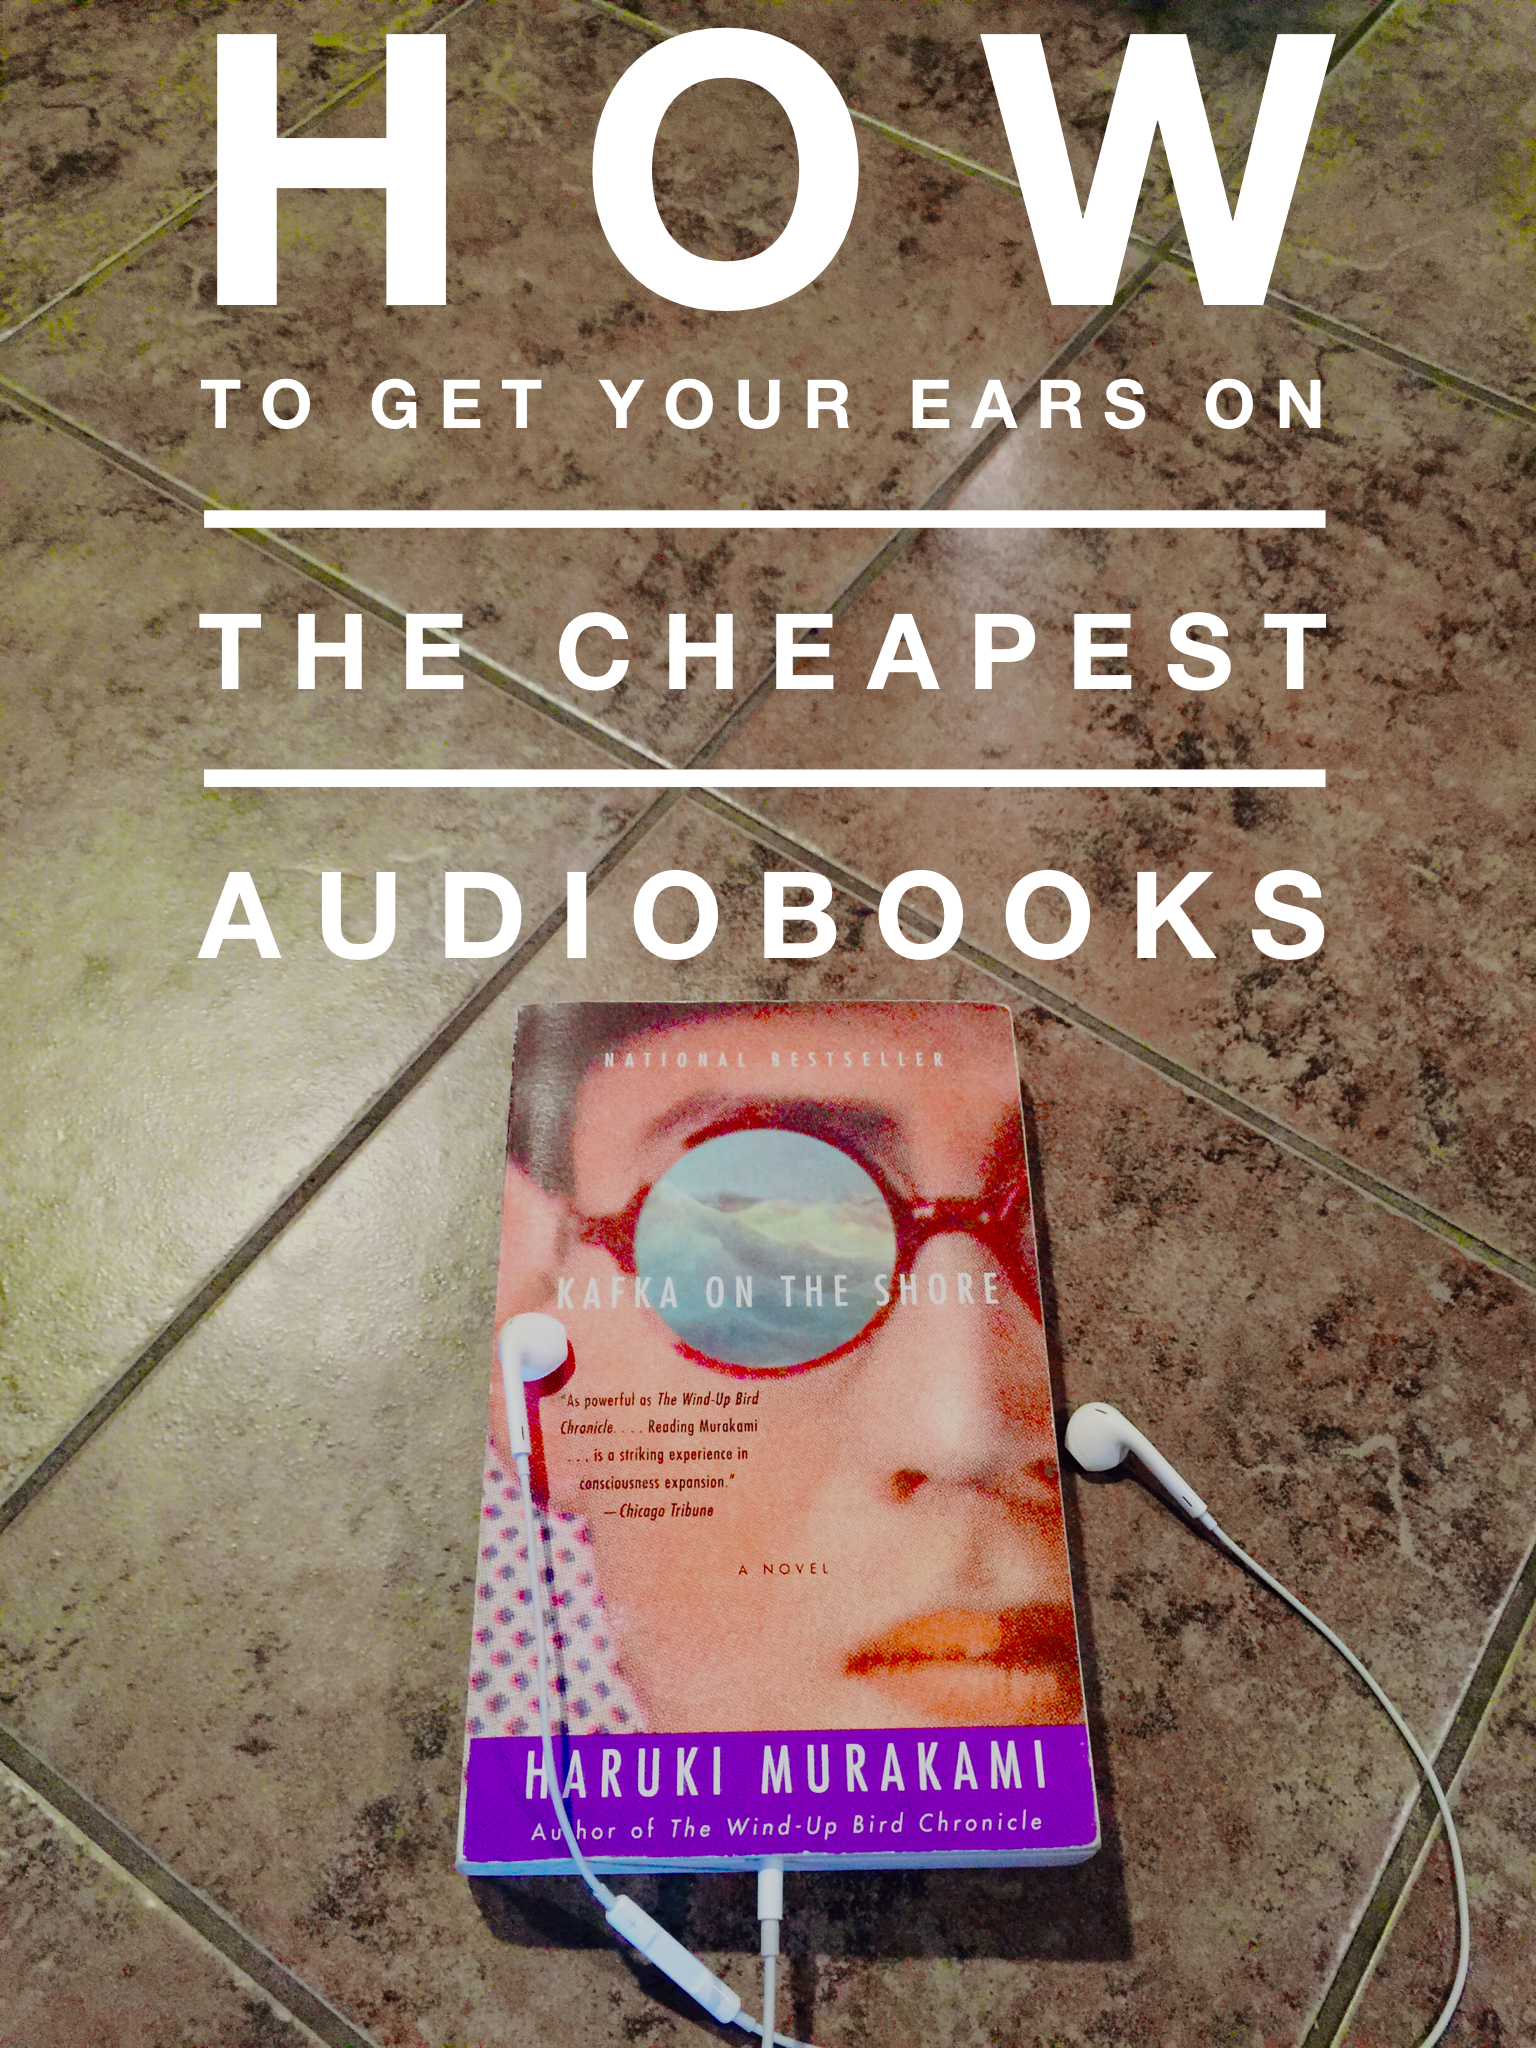 after dark haruki murakami audiobook